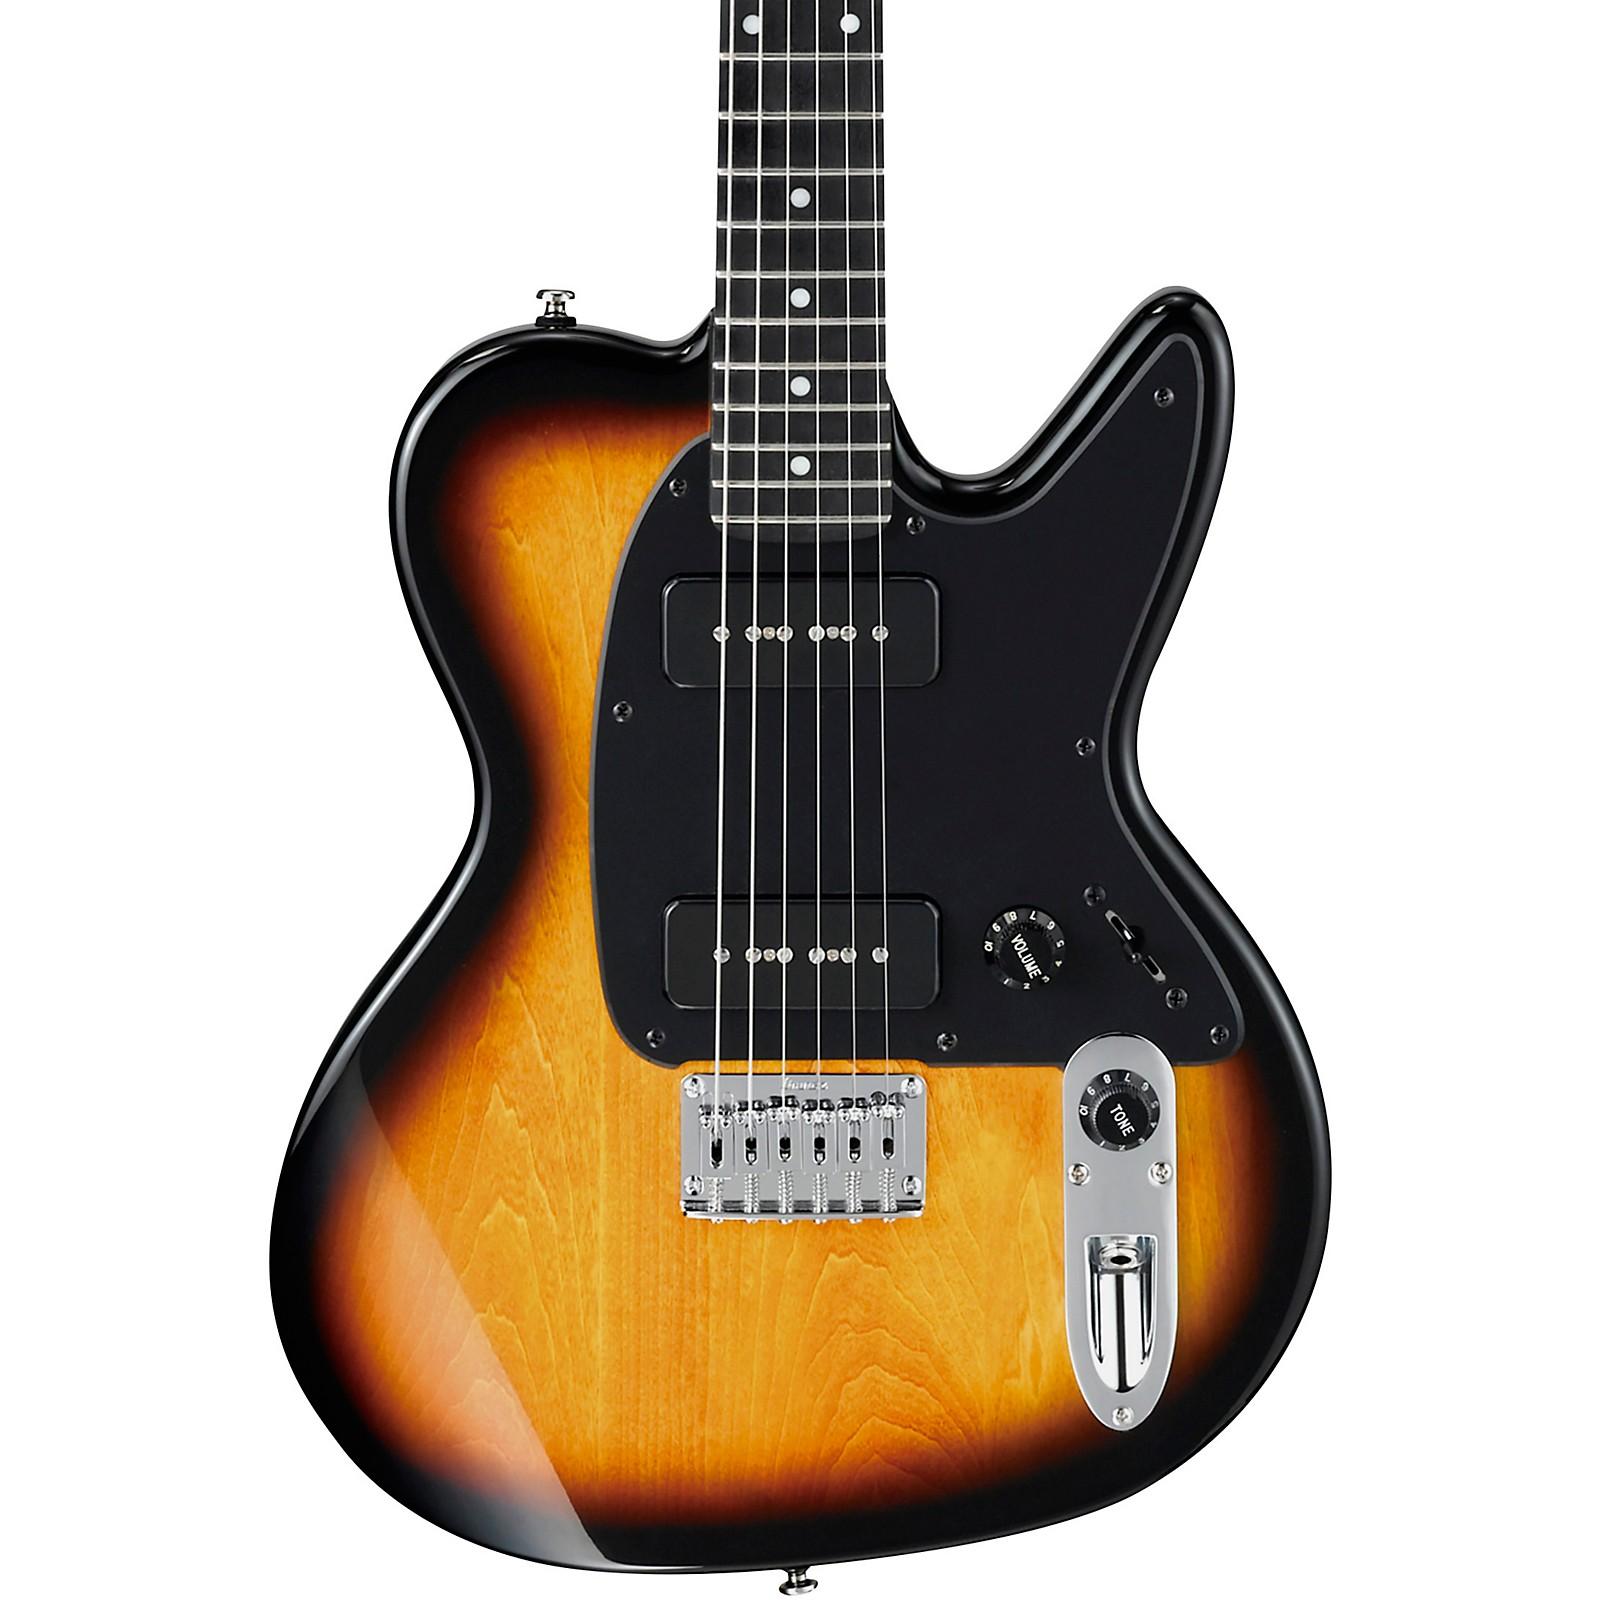 Ibanez Noodles NDM5 Signature 6-String Electric Guitar